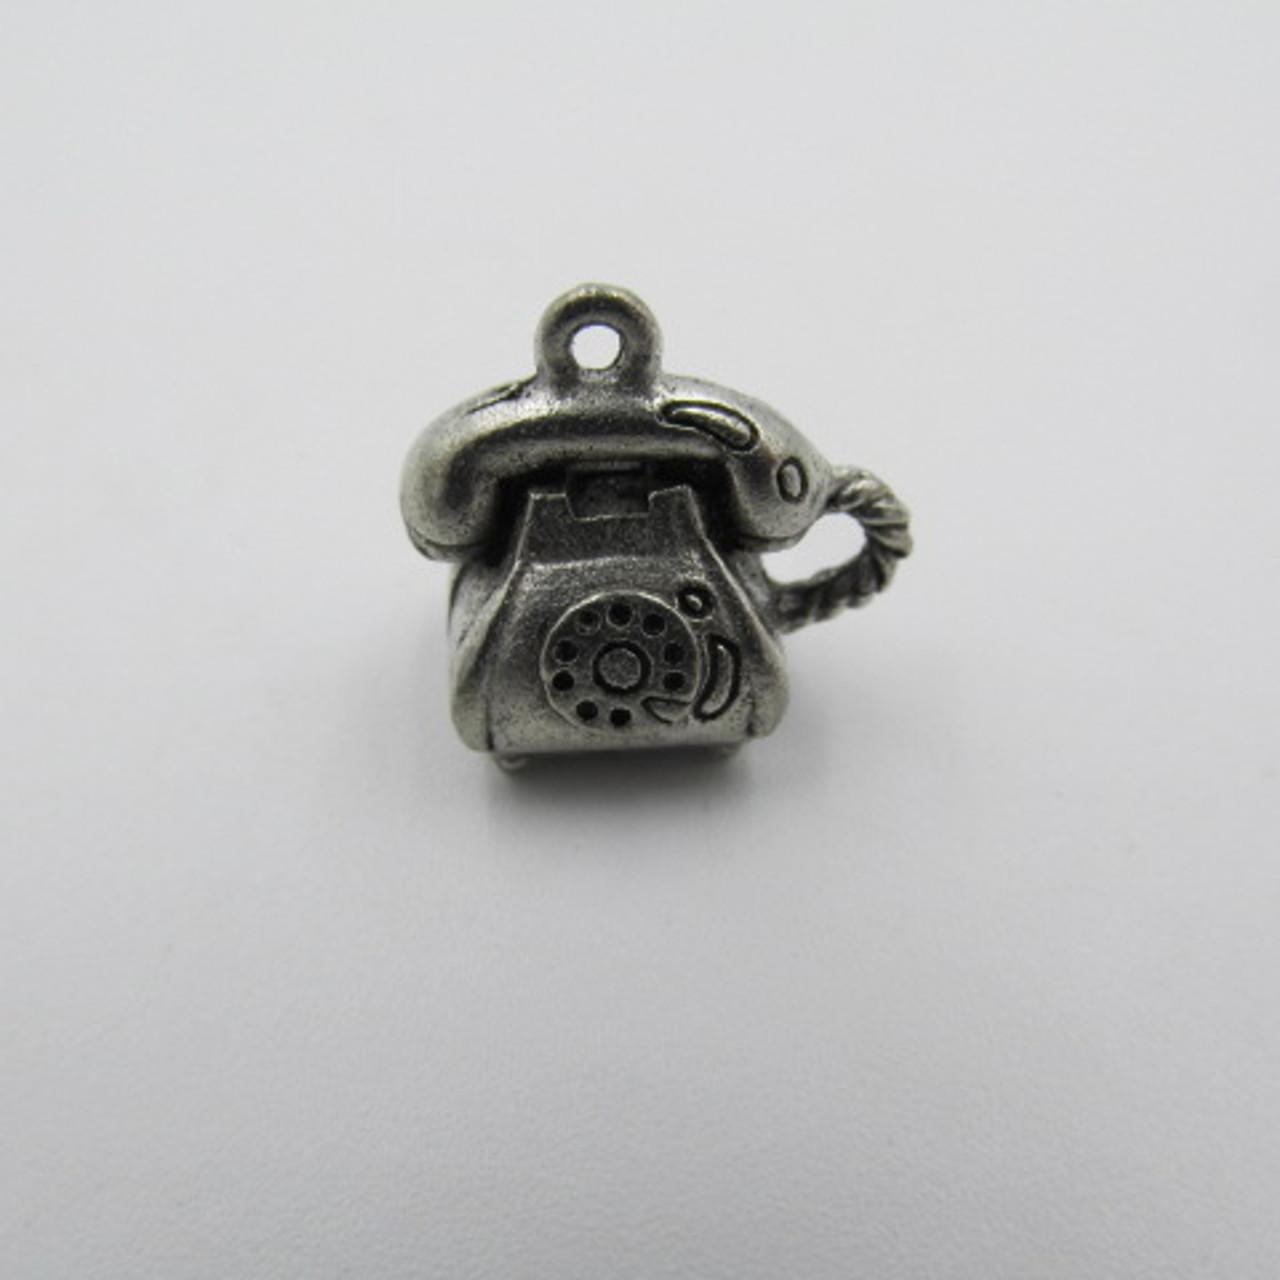 Telephone Pewter Charm